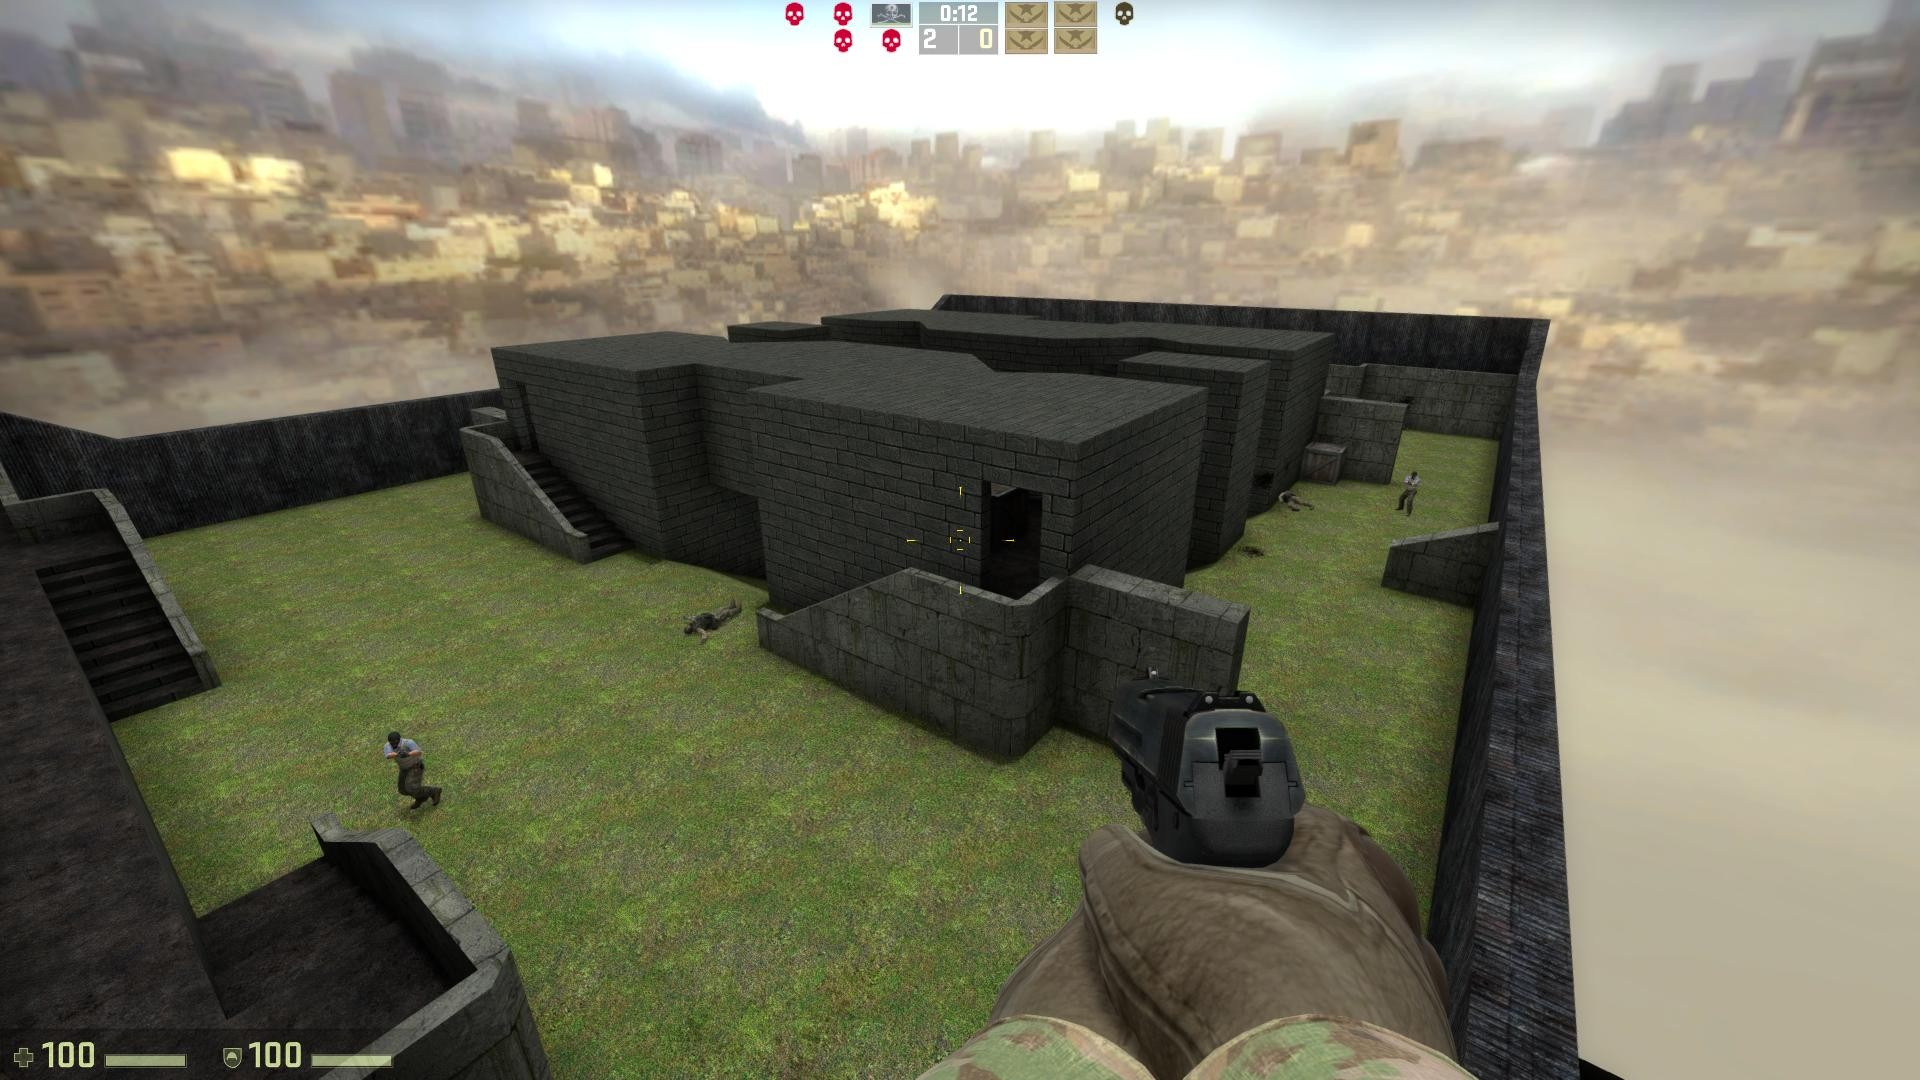 http://endgegner.fightercom.de/CounterStrikeGlobalOffensive/screen-ar_hatearena1.jpg